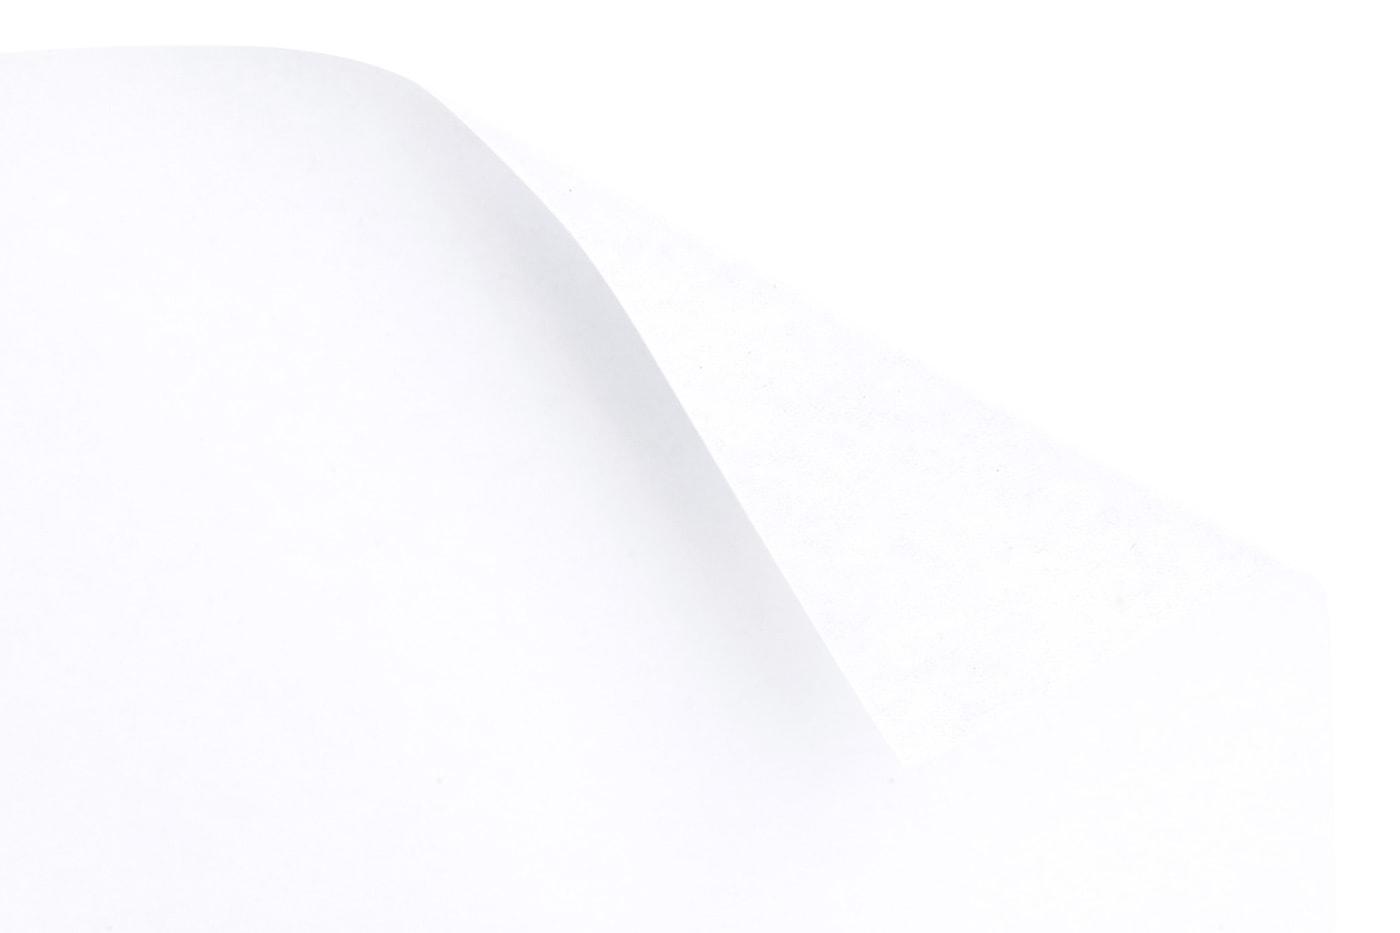 Seidenpapier hochweiß 25g/m² 50x75cm